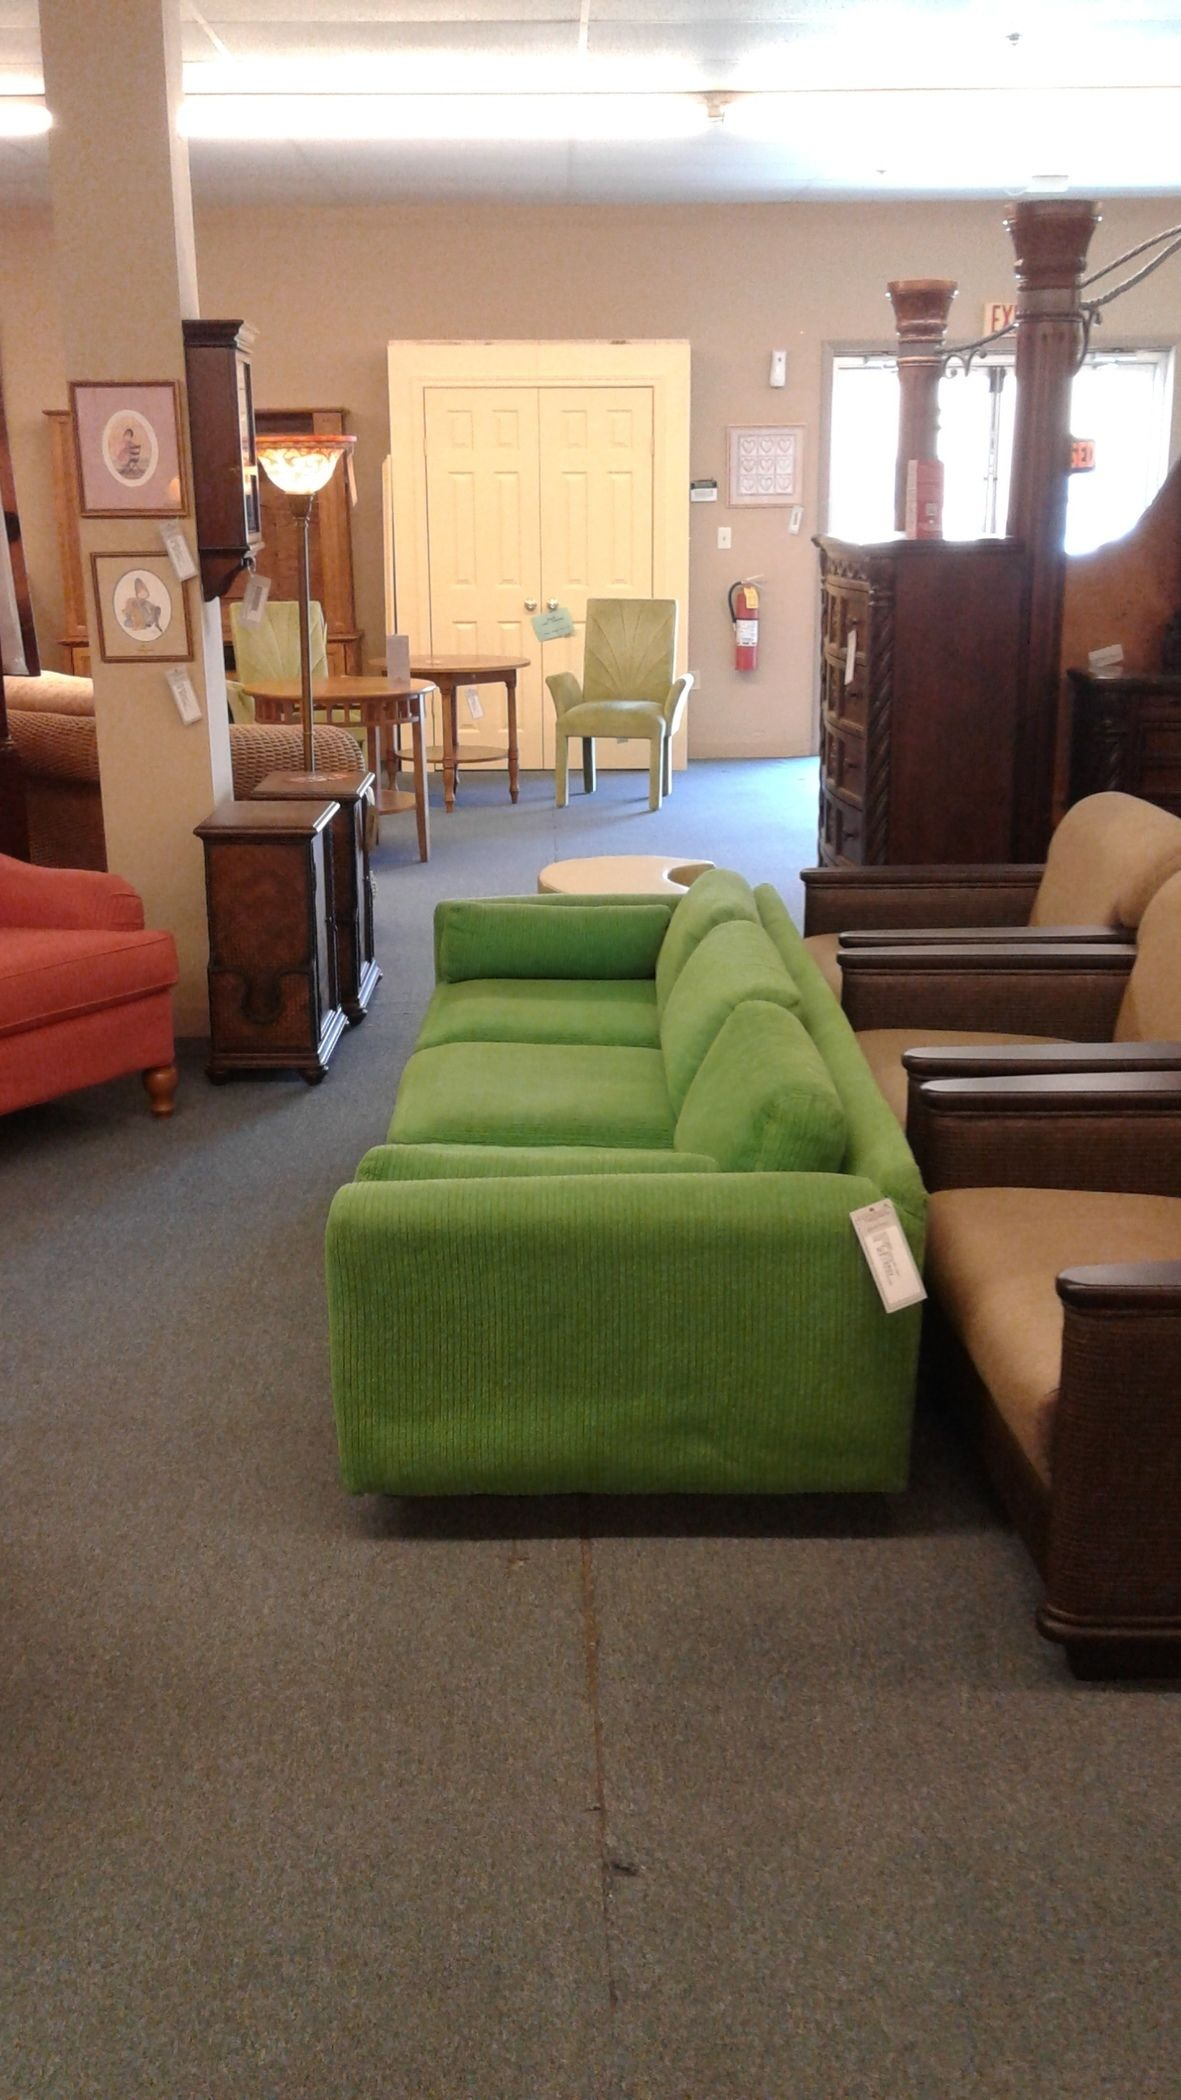 Kelly Green Corduroy Sofa Delmarva Furniture Consignment